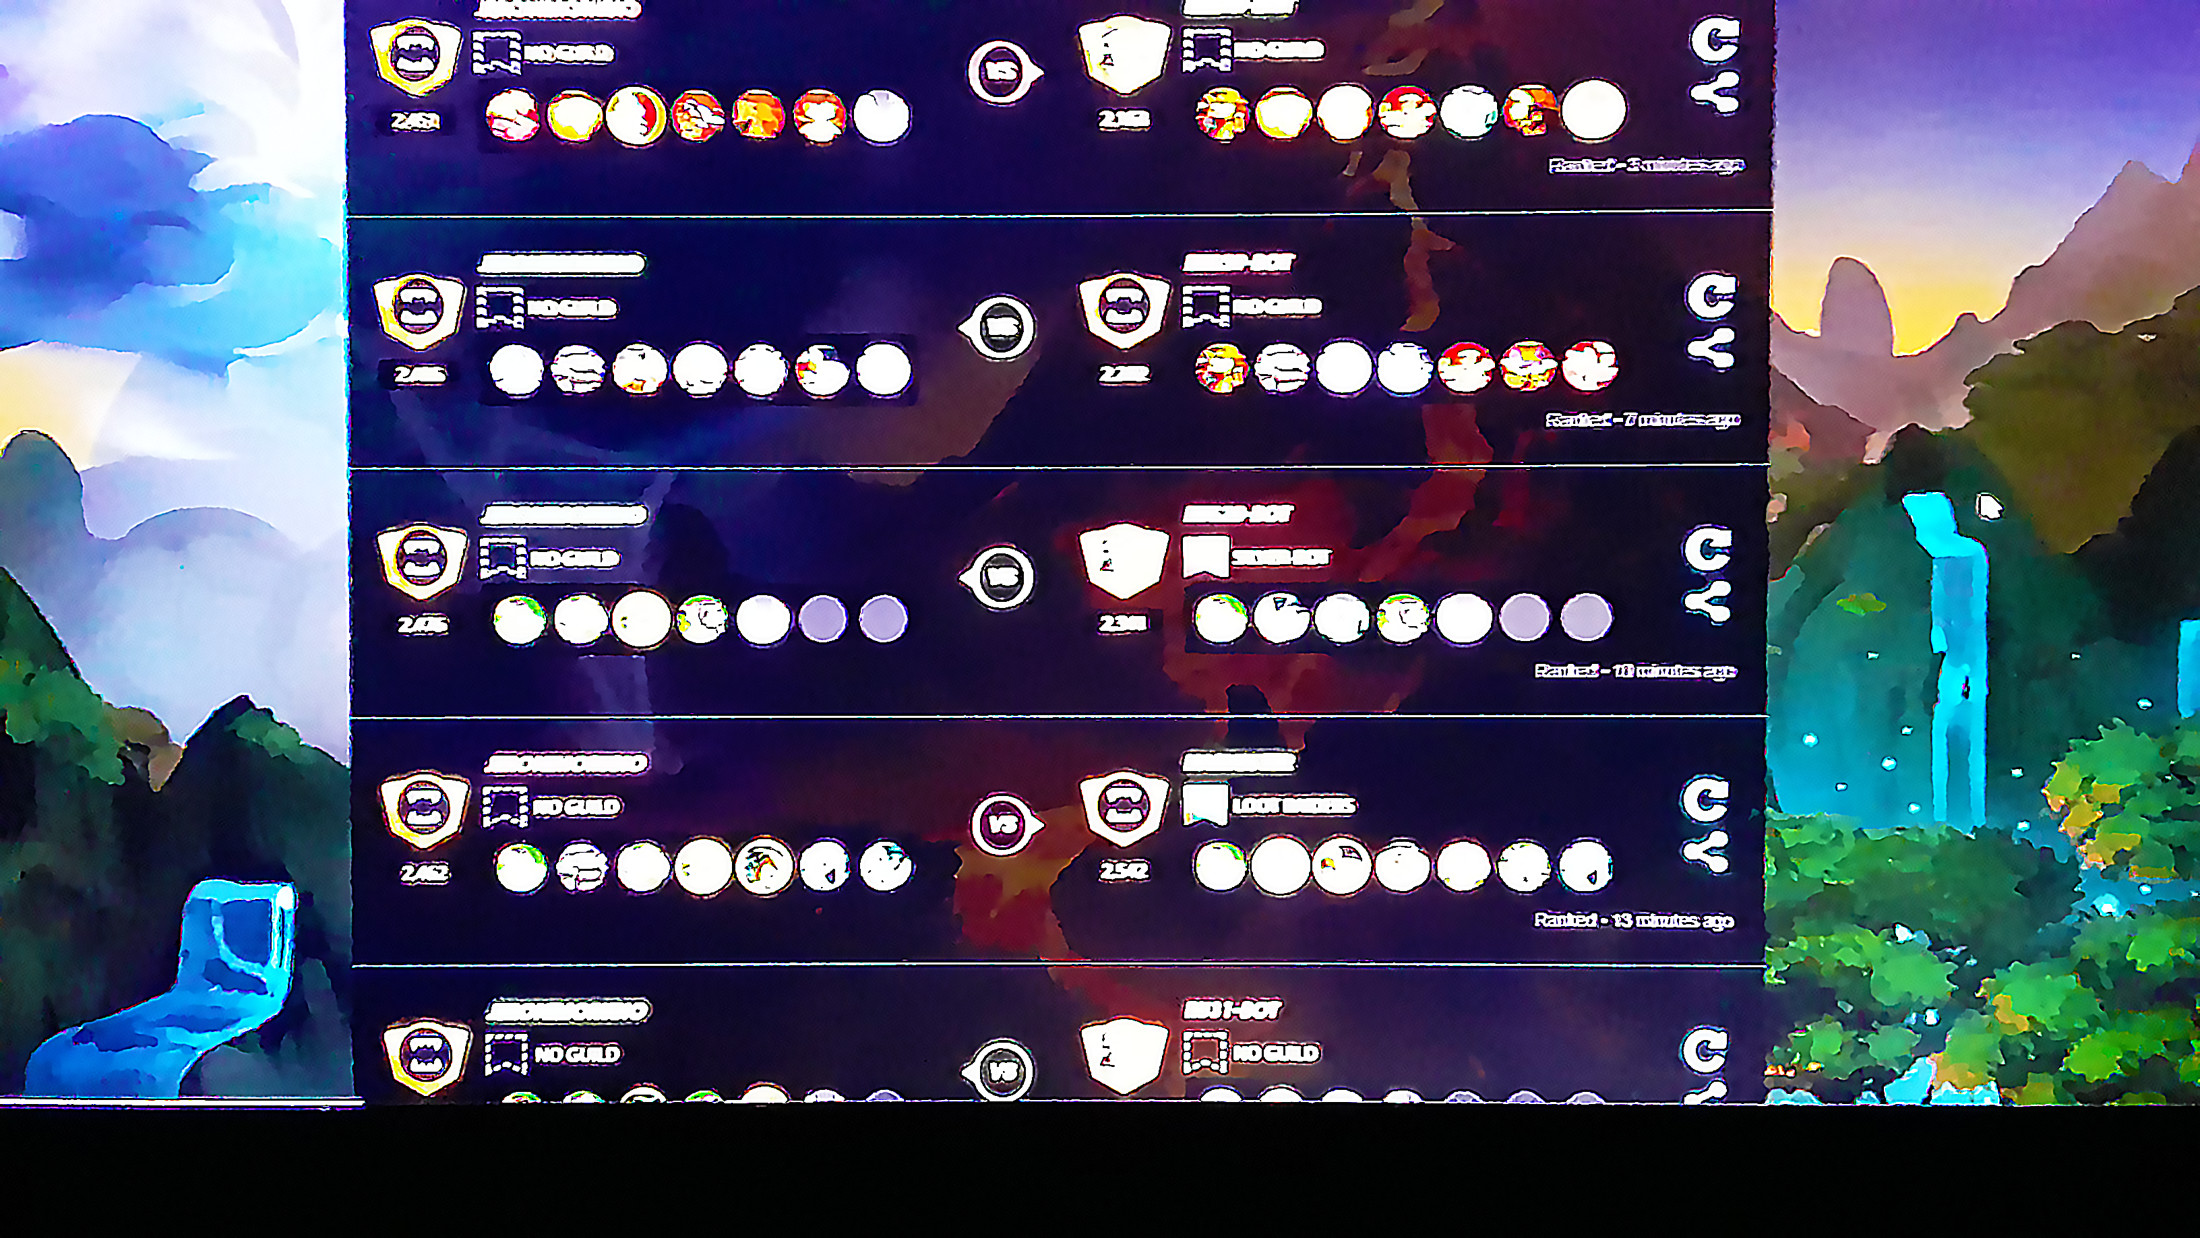 splinterlands, Soundscapes Radio, bots, restream.io, paladins, bot invasion, live streaming, twitch, dtube, steem, gaming video, YouTube, facebook, jeronimorubio, jeronimo rubio (410).jpg